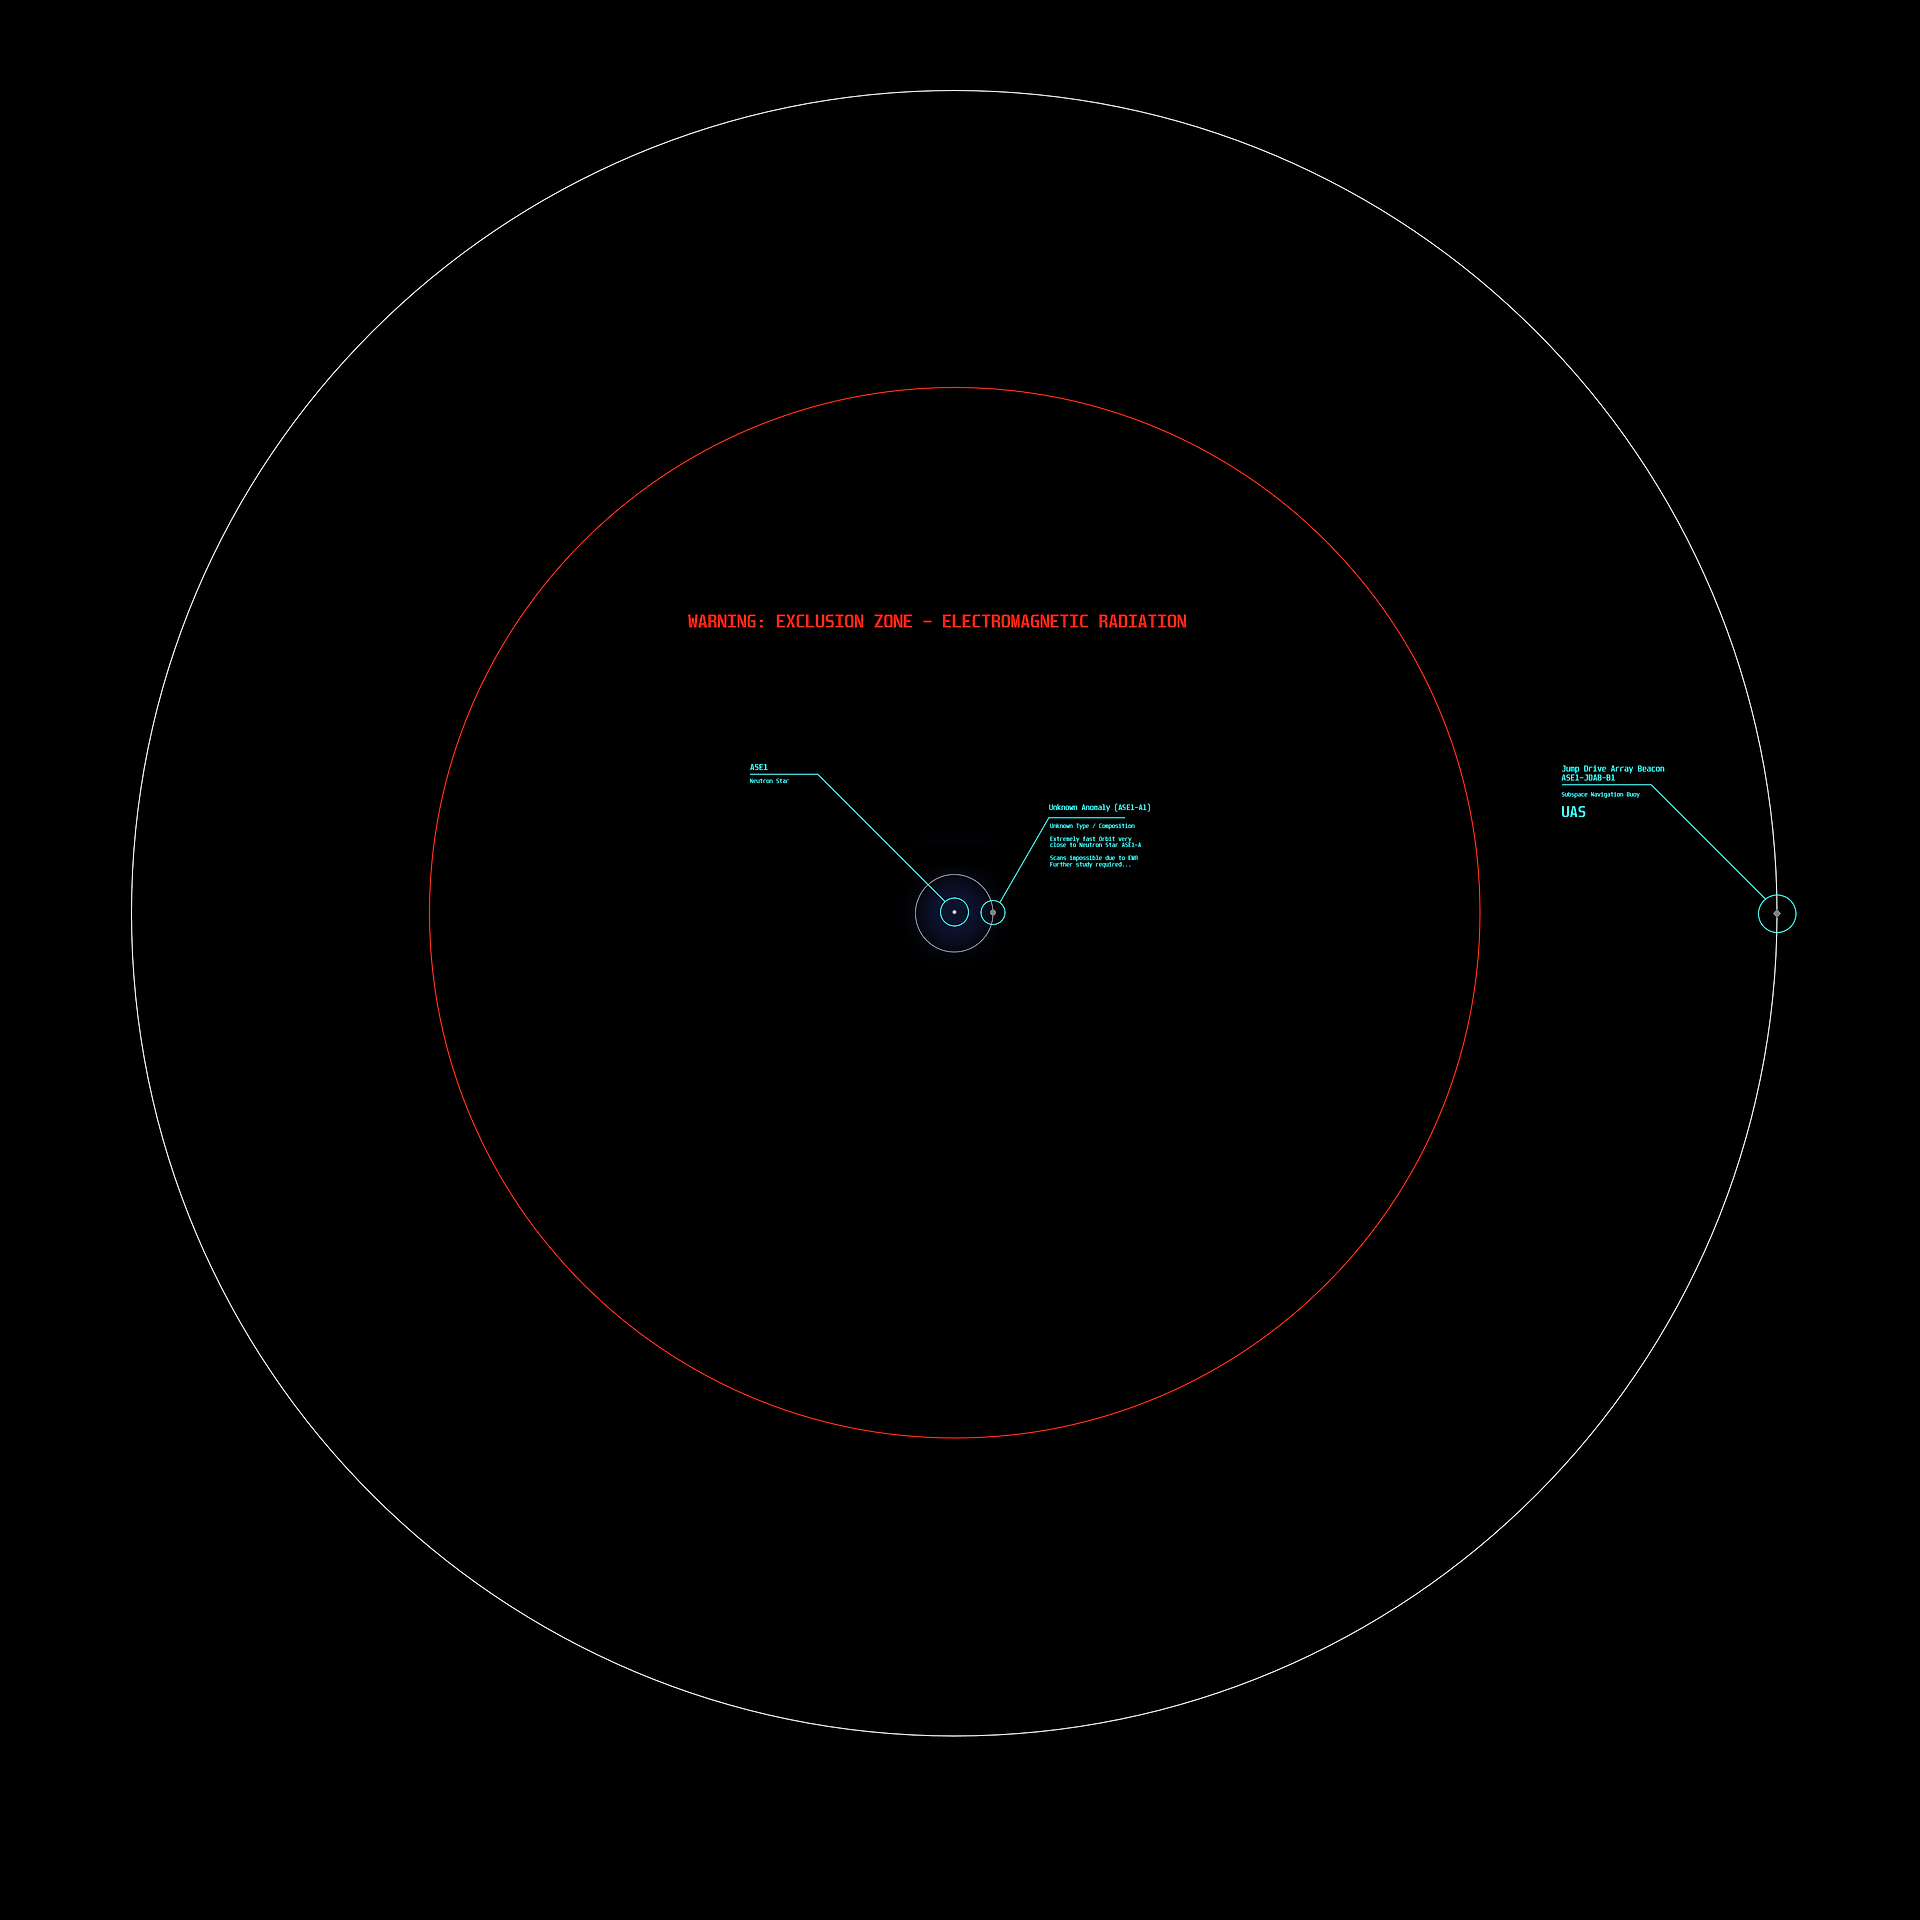 (Angel Nebula - Expanse) AS-E-1